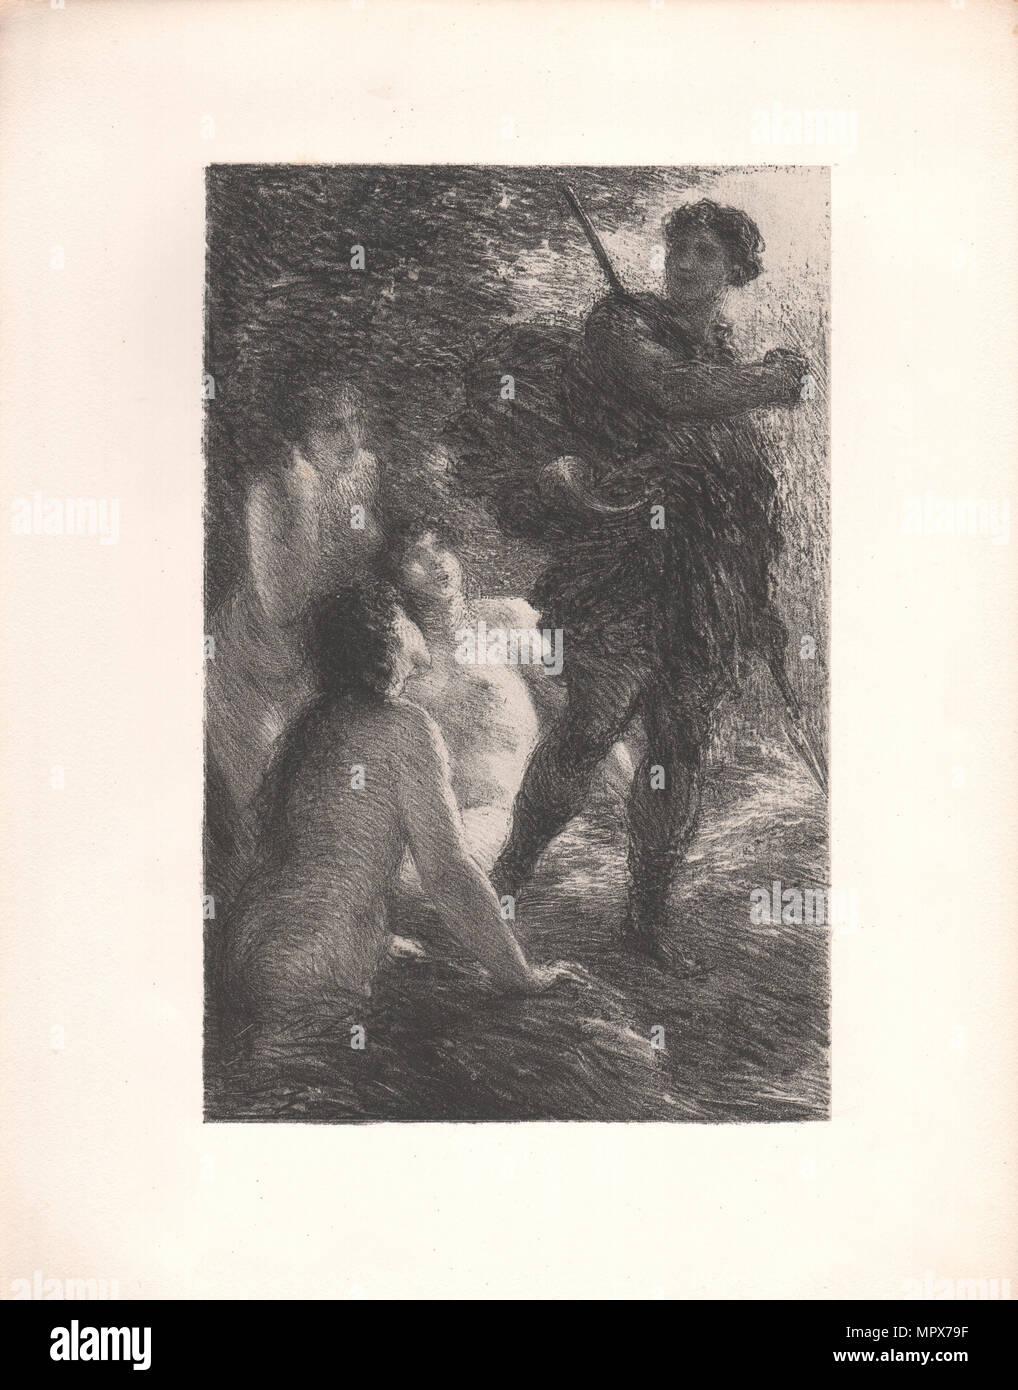 The Twilight of the Gods, 1886. - Stock Image